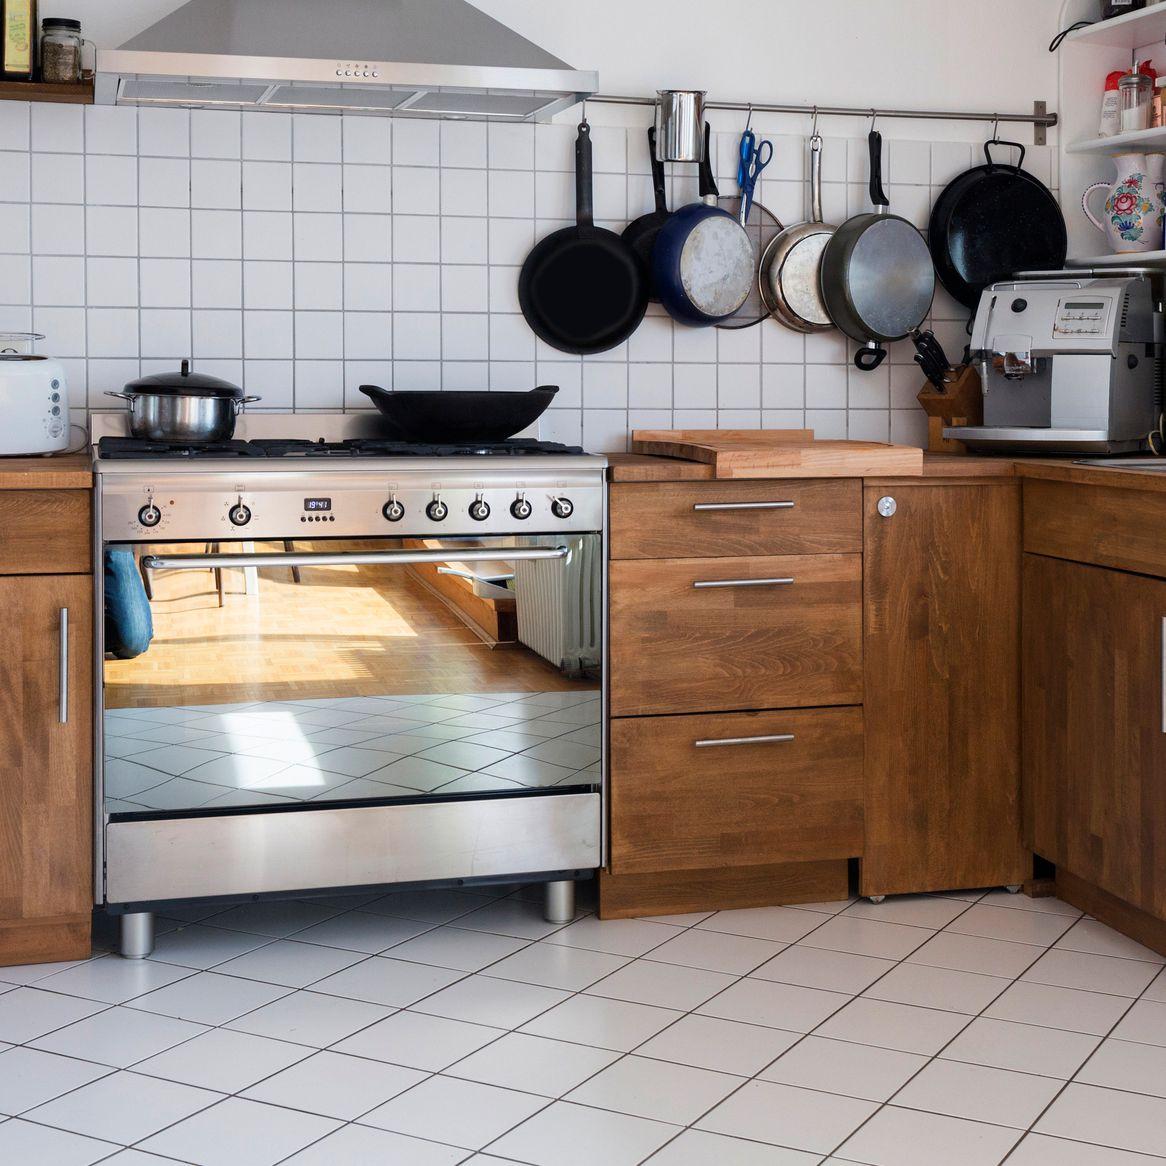 - Best Types Of Tile Grout Sealants